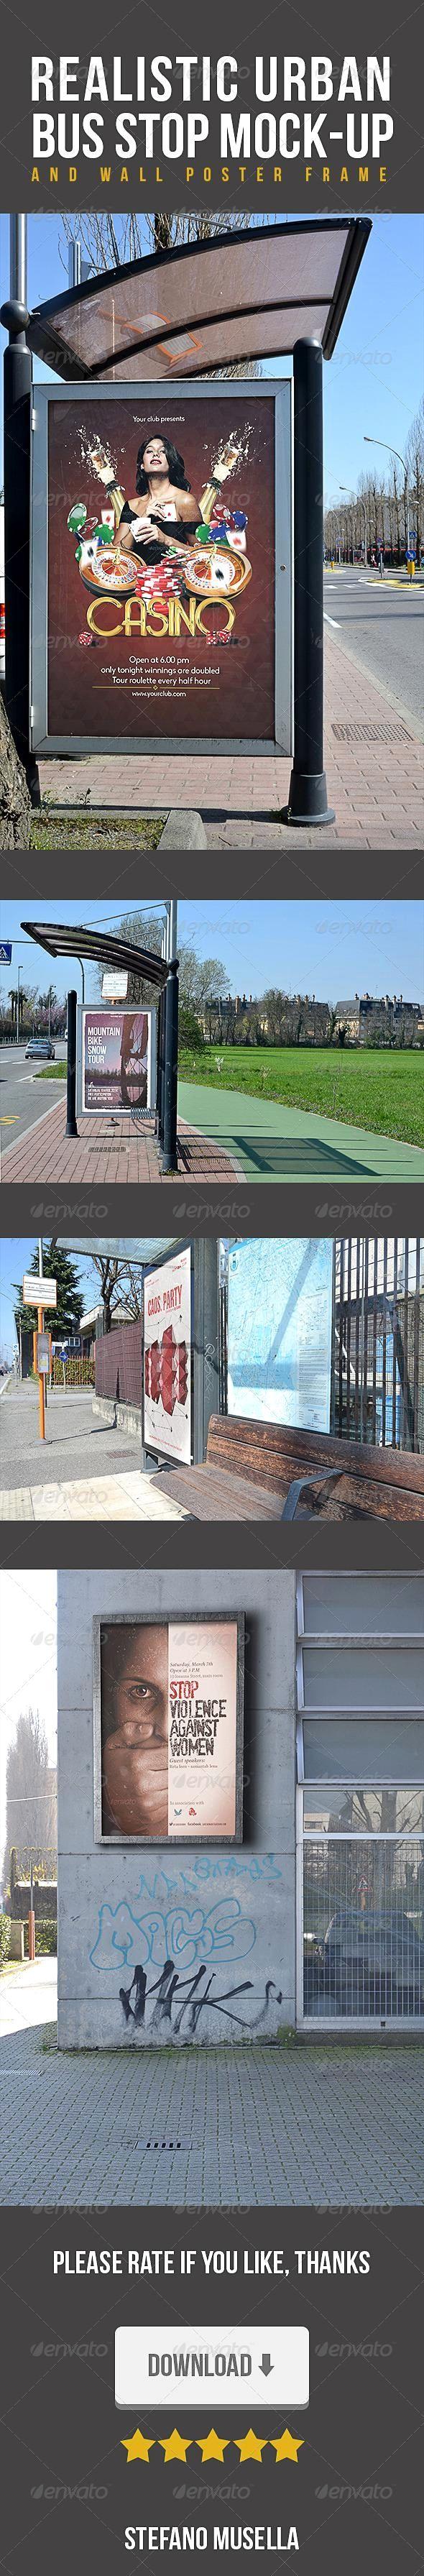 Realistic Urban Stop Bus Mockup for $7  #mockups #psd #flyer #FlyerMockup #Flyer...